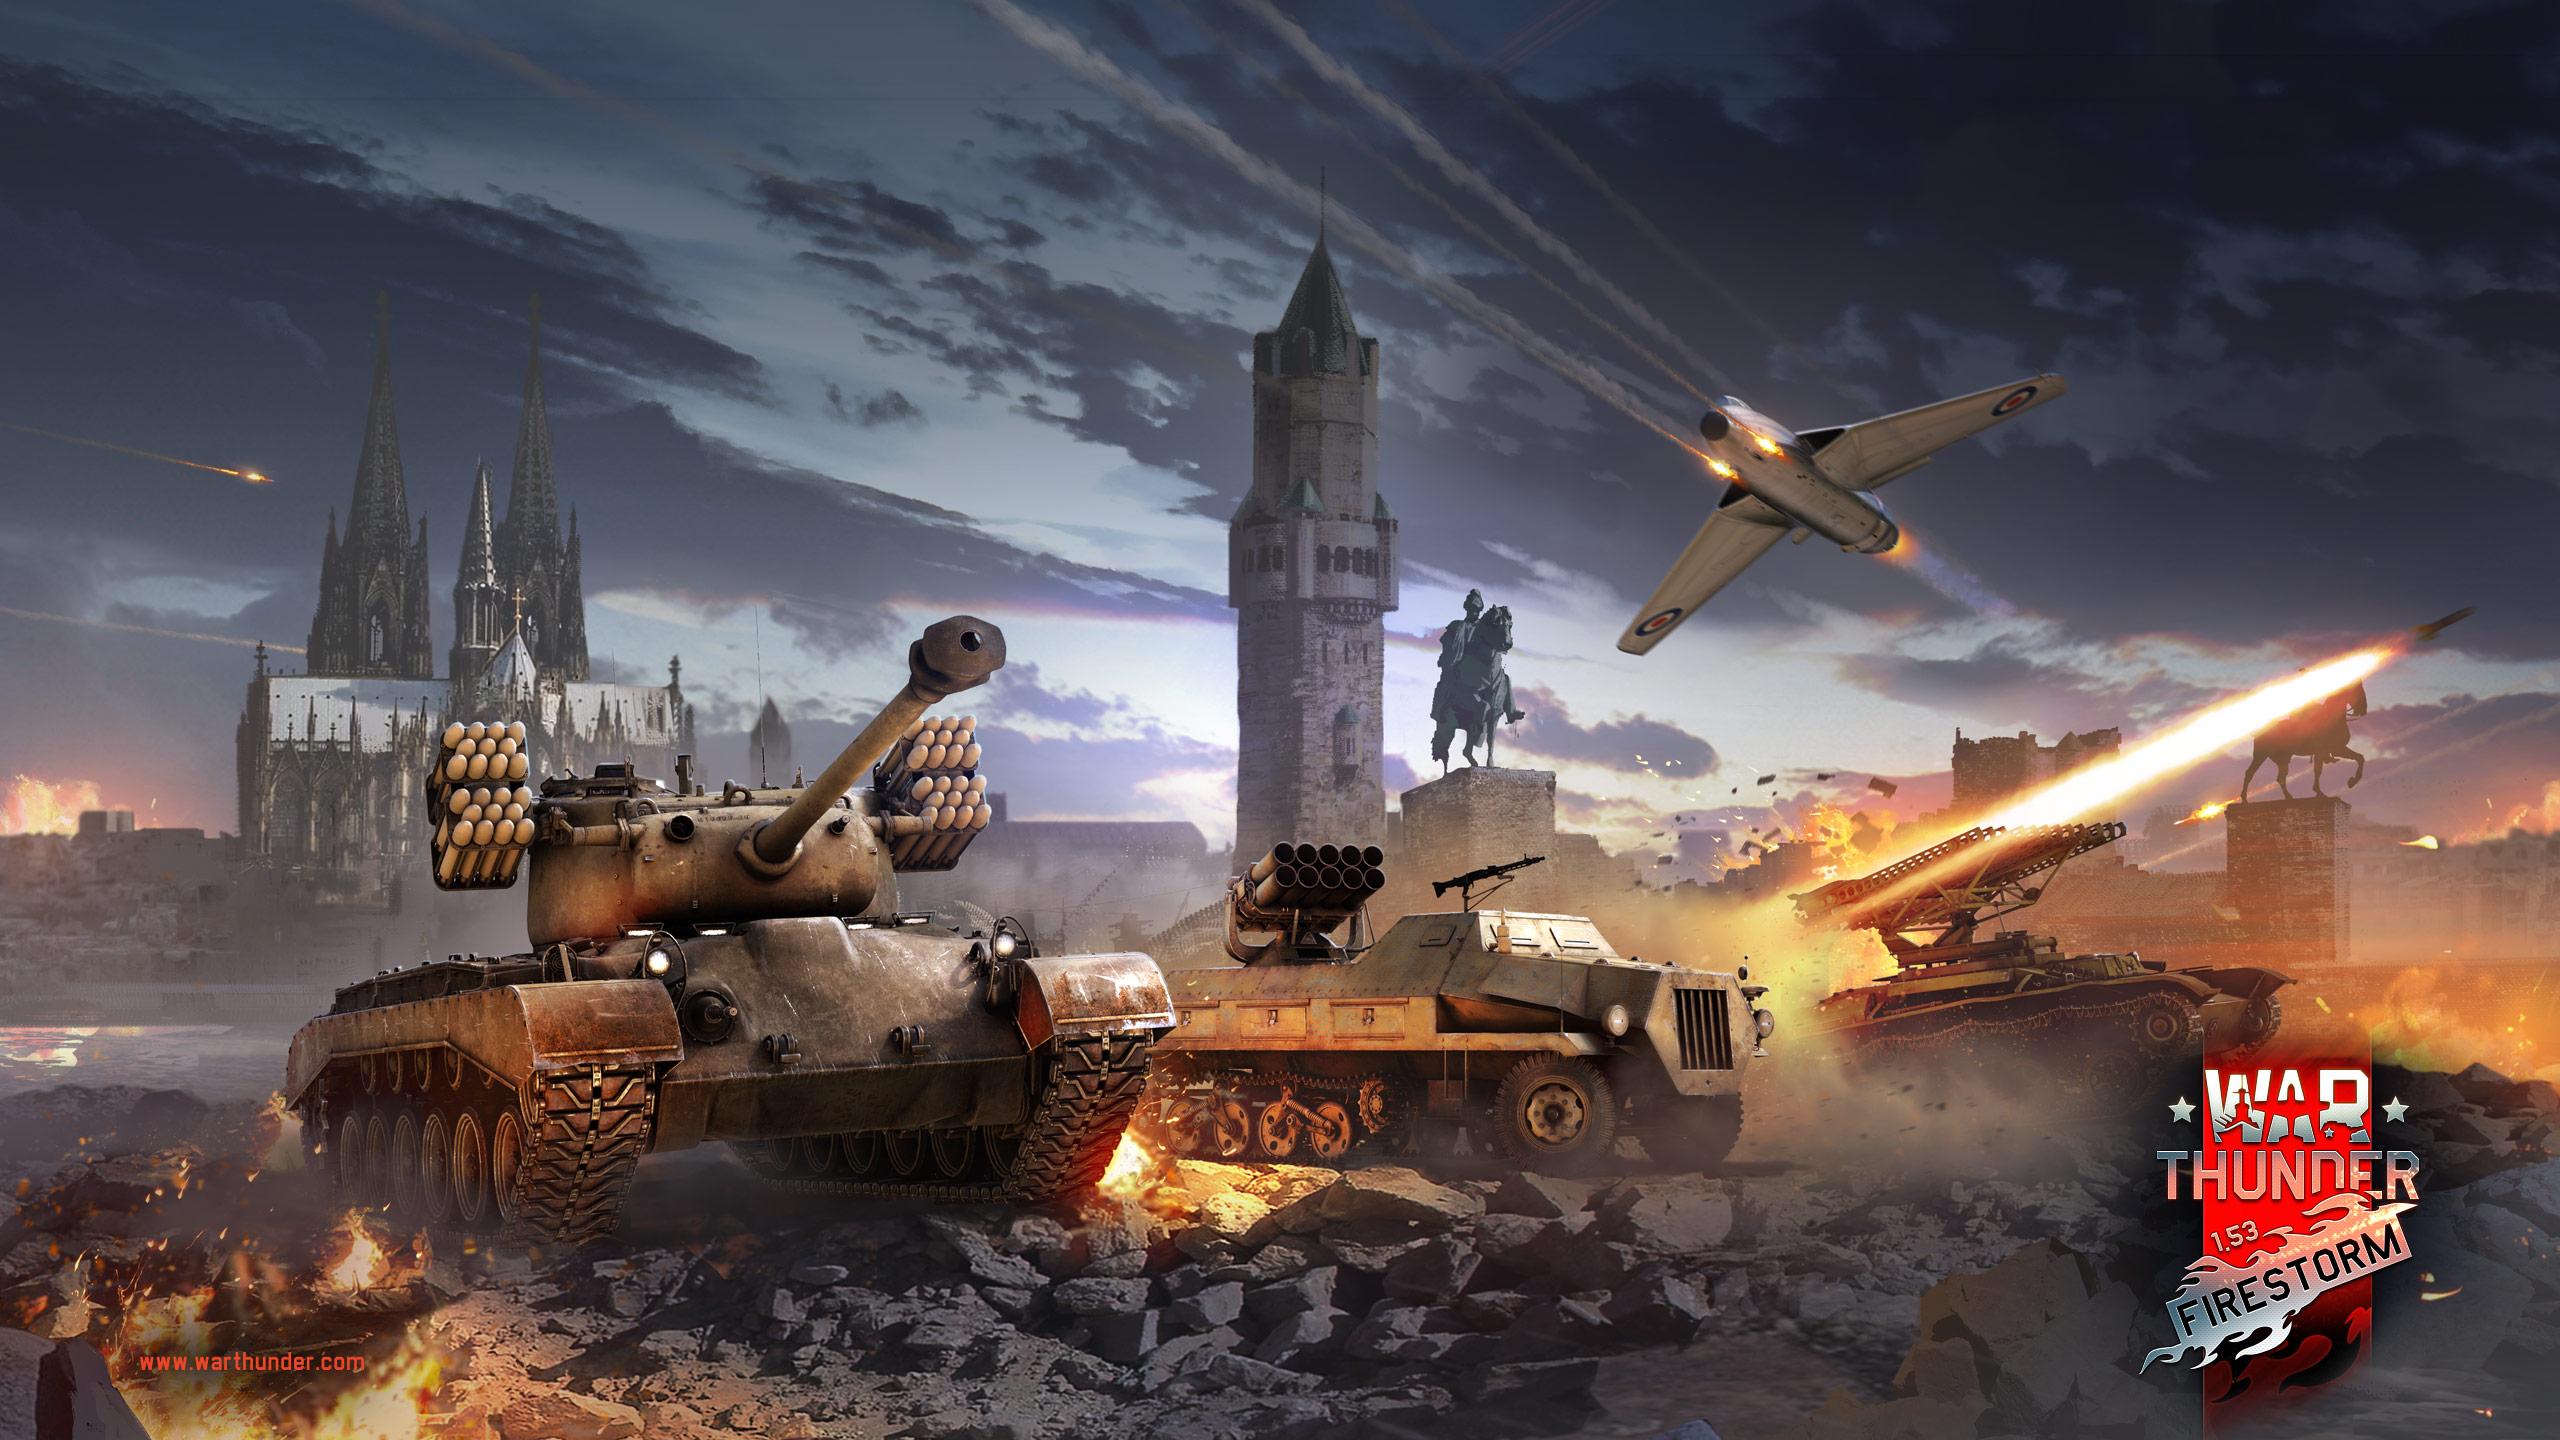 war thunder backgrounds